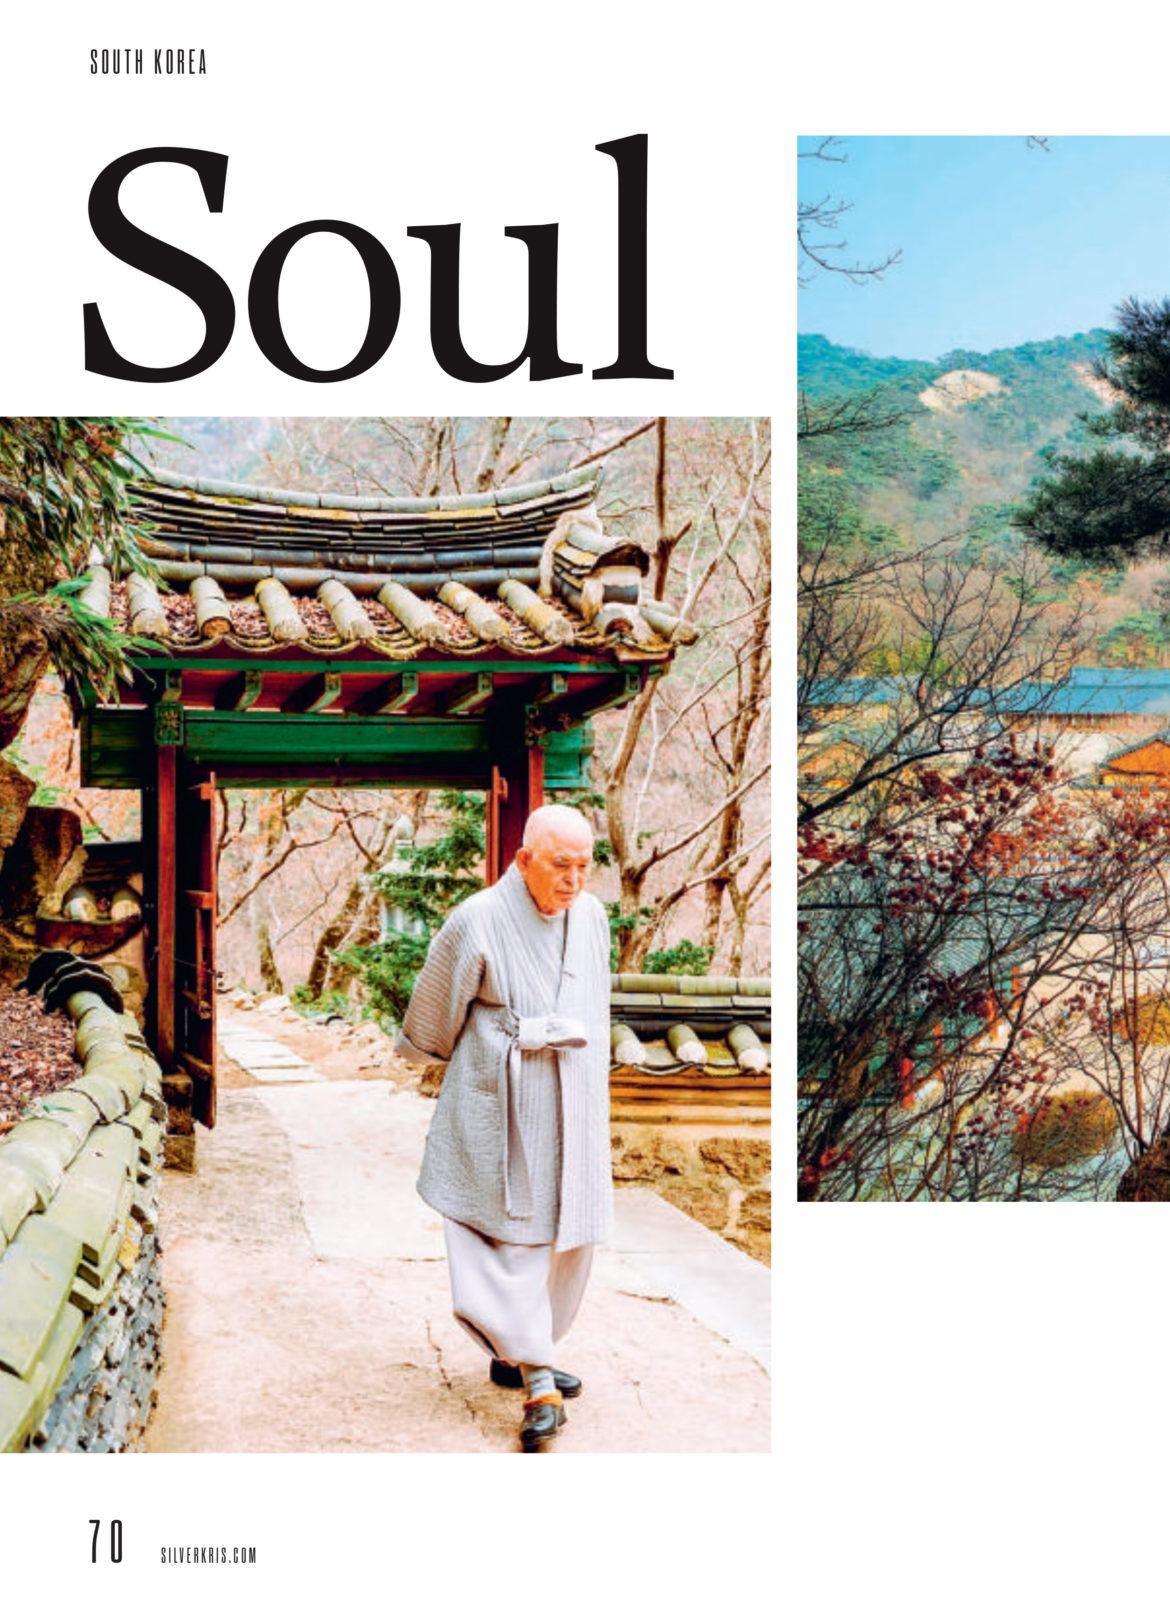 South Korea's Templestay